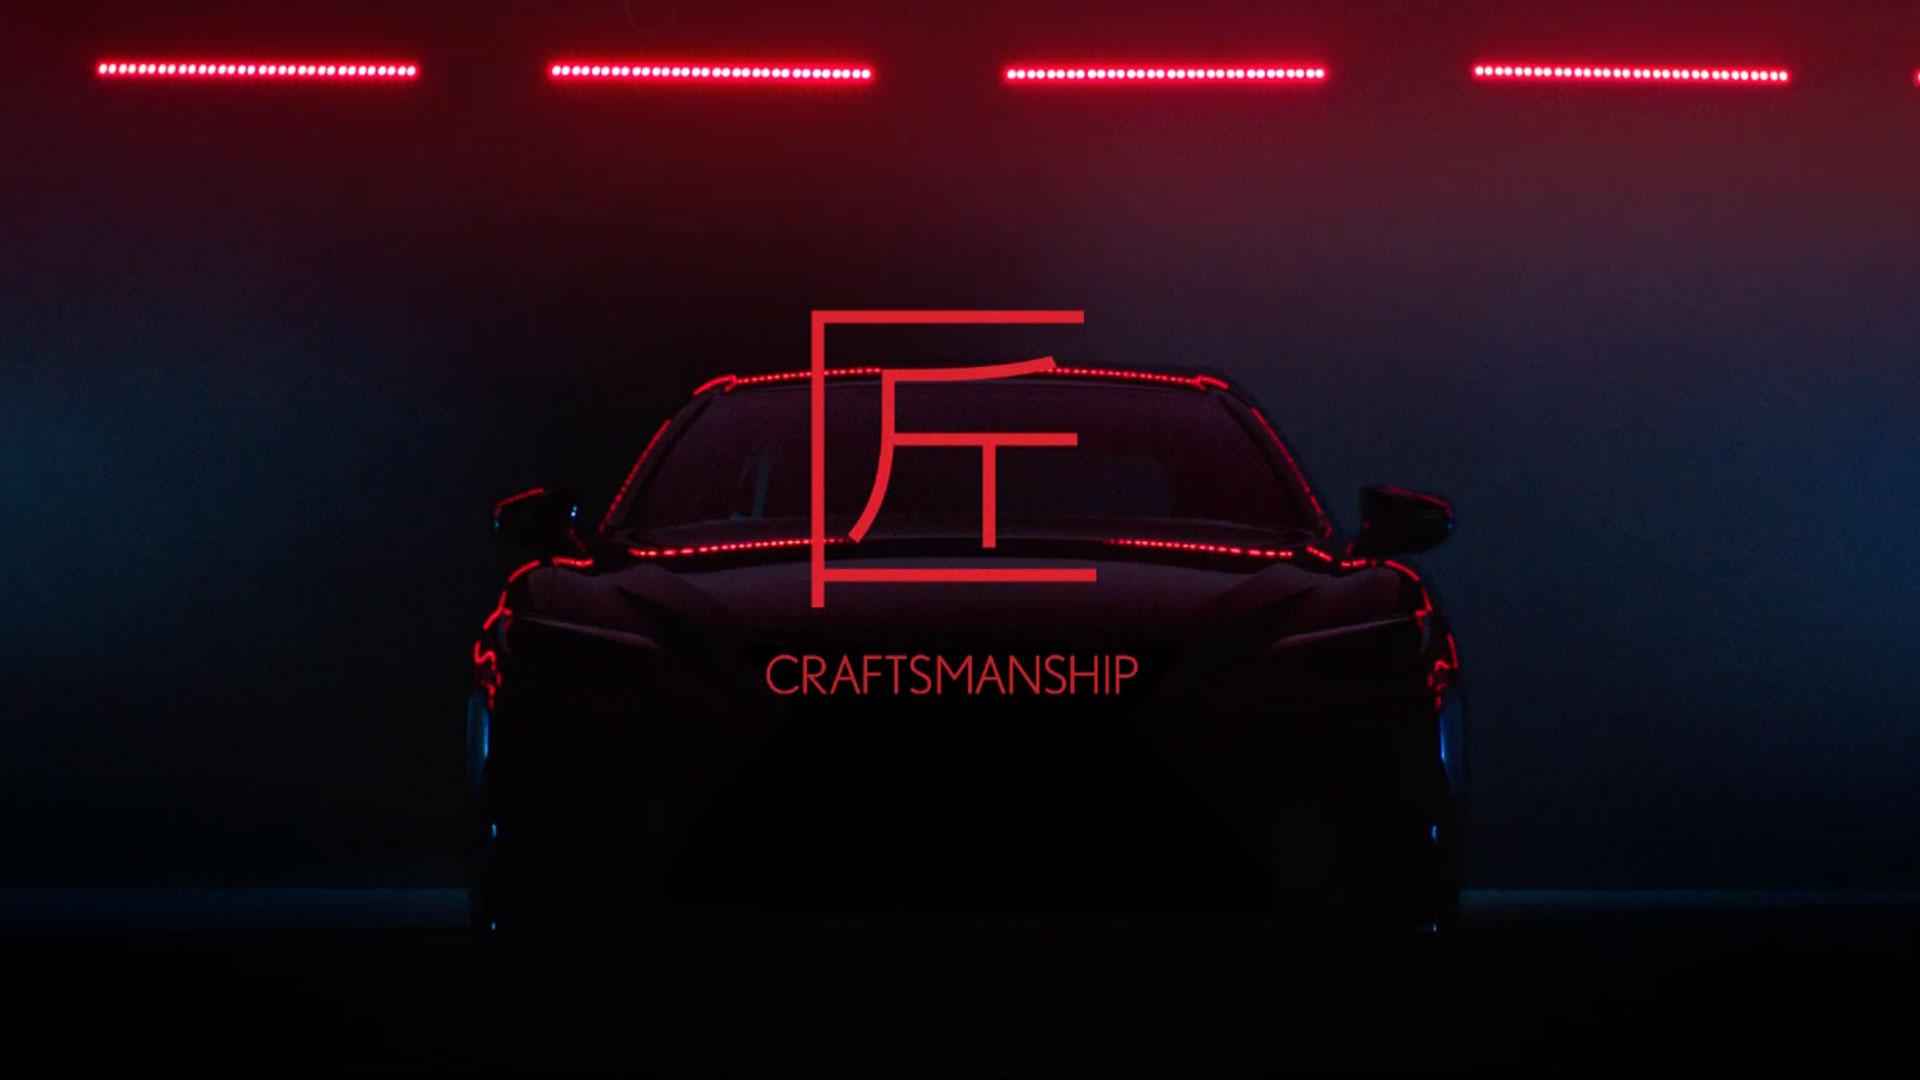 Craftmanship poster